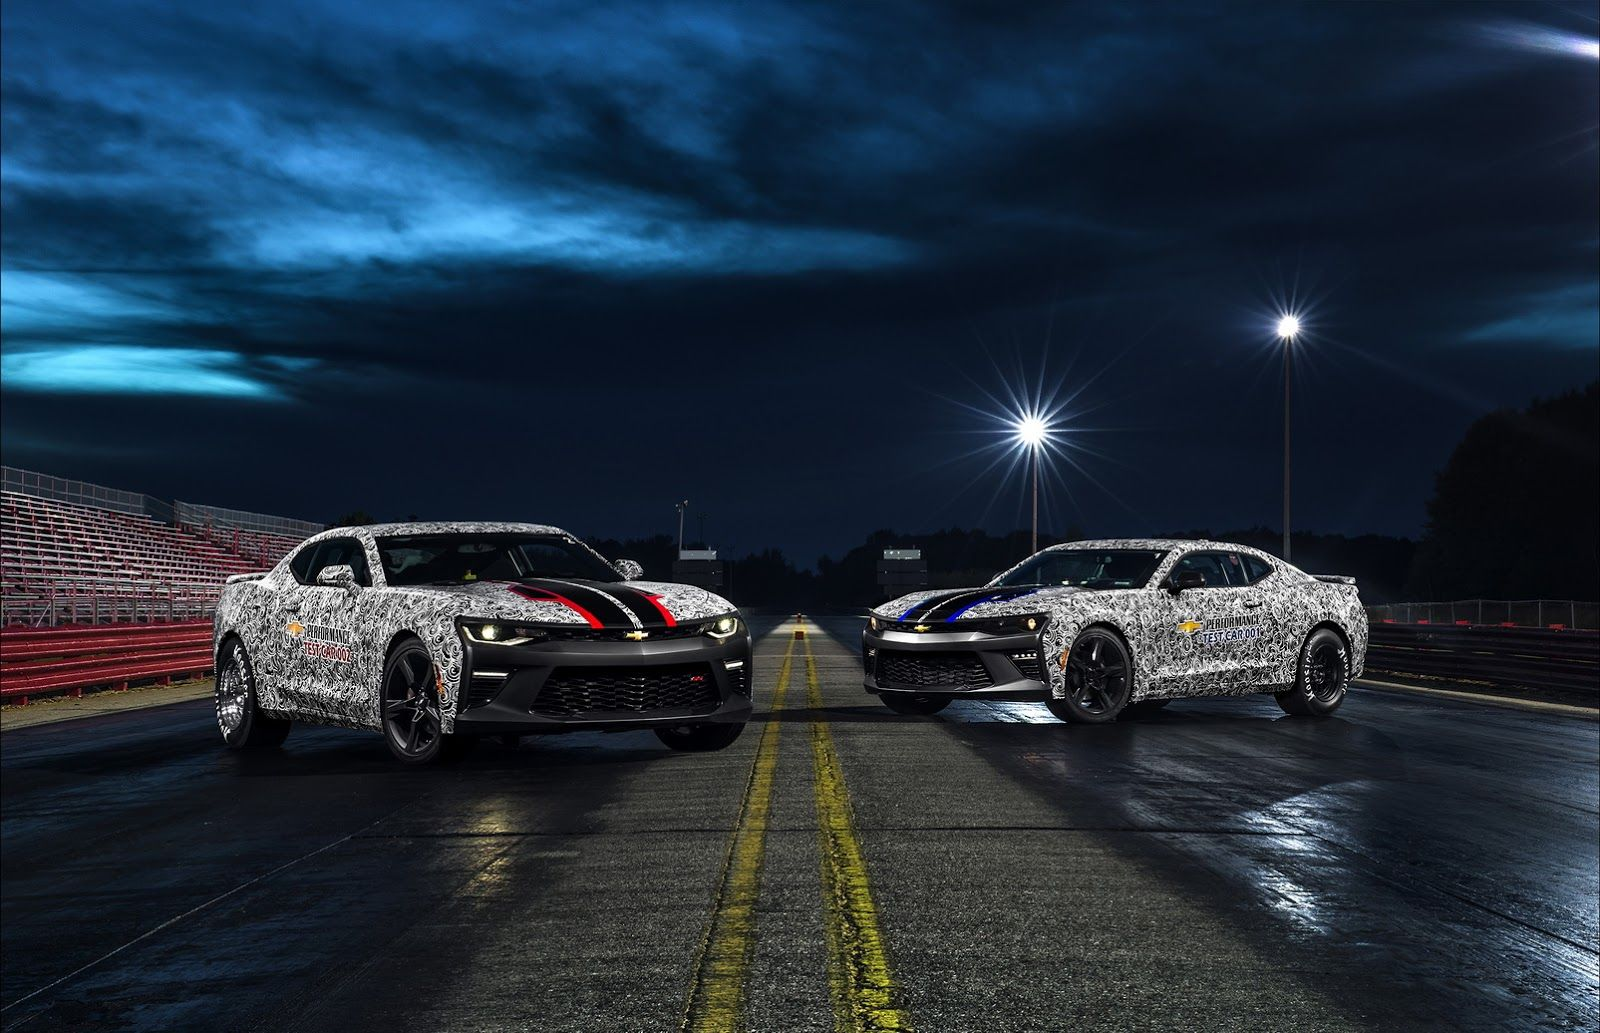 New 2017 Chevy Camaro Copo Ready To Conquer The 1 4 Mile Camaro